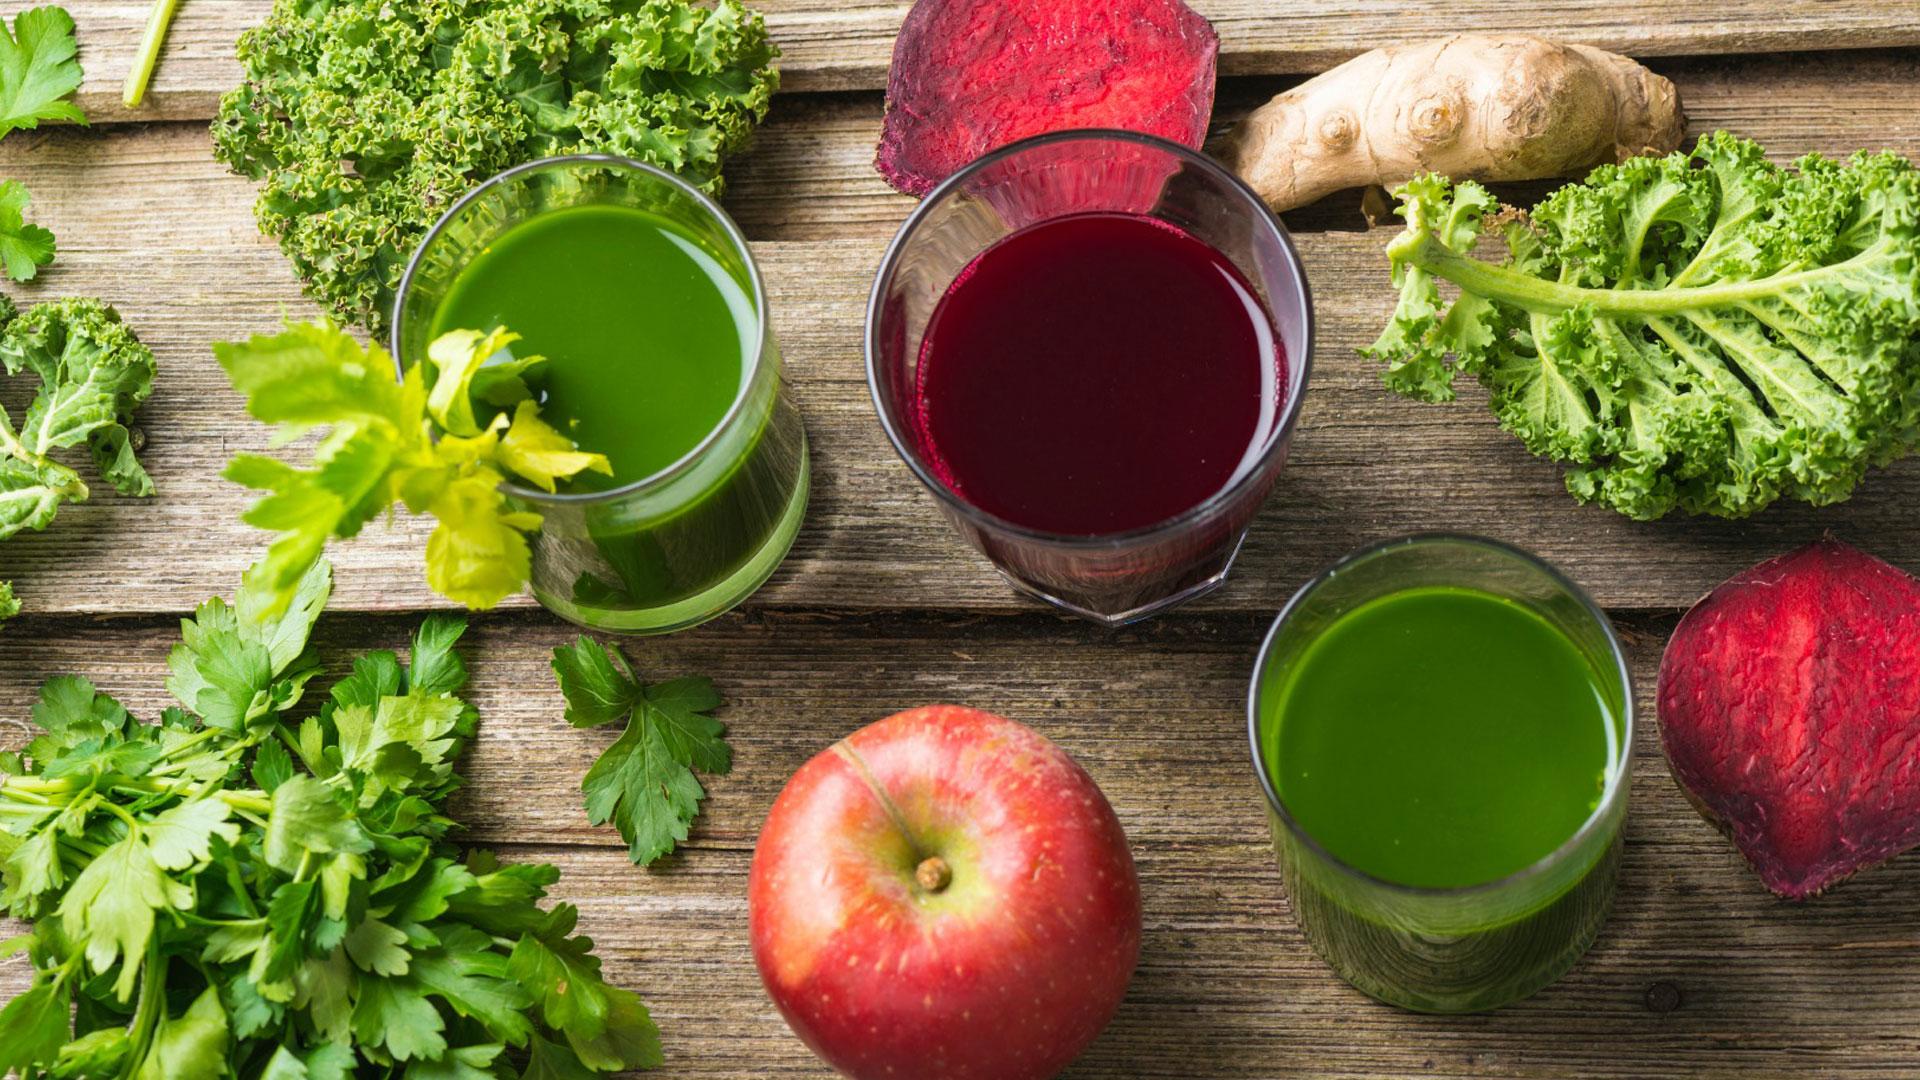 La dieta SIRT: dimagrire senza soffrire? | Manipulus Mosca